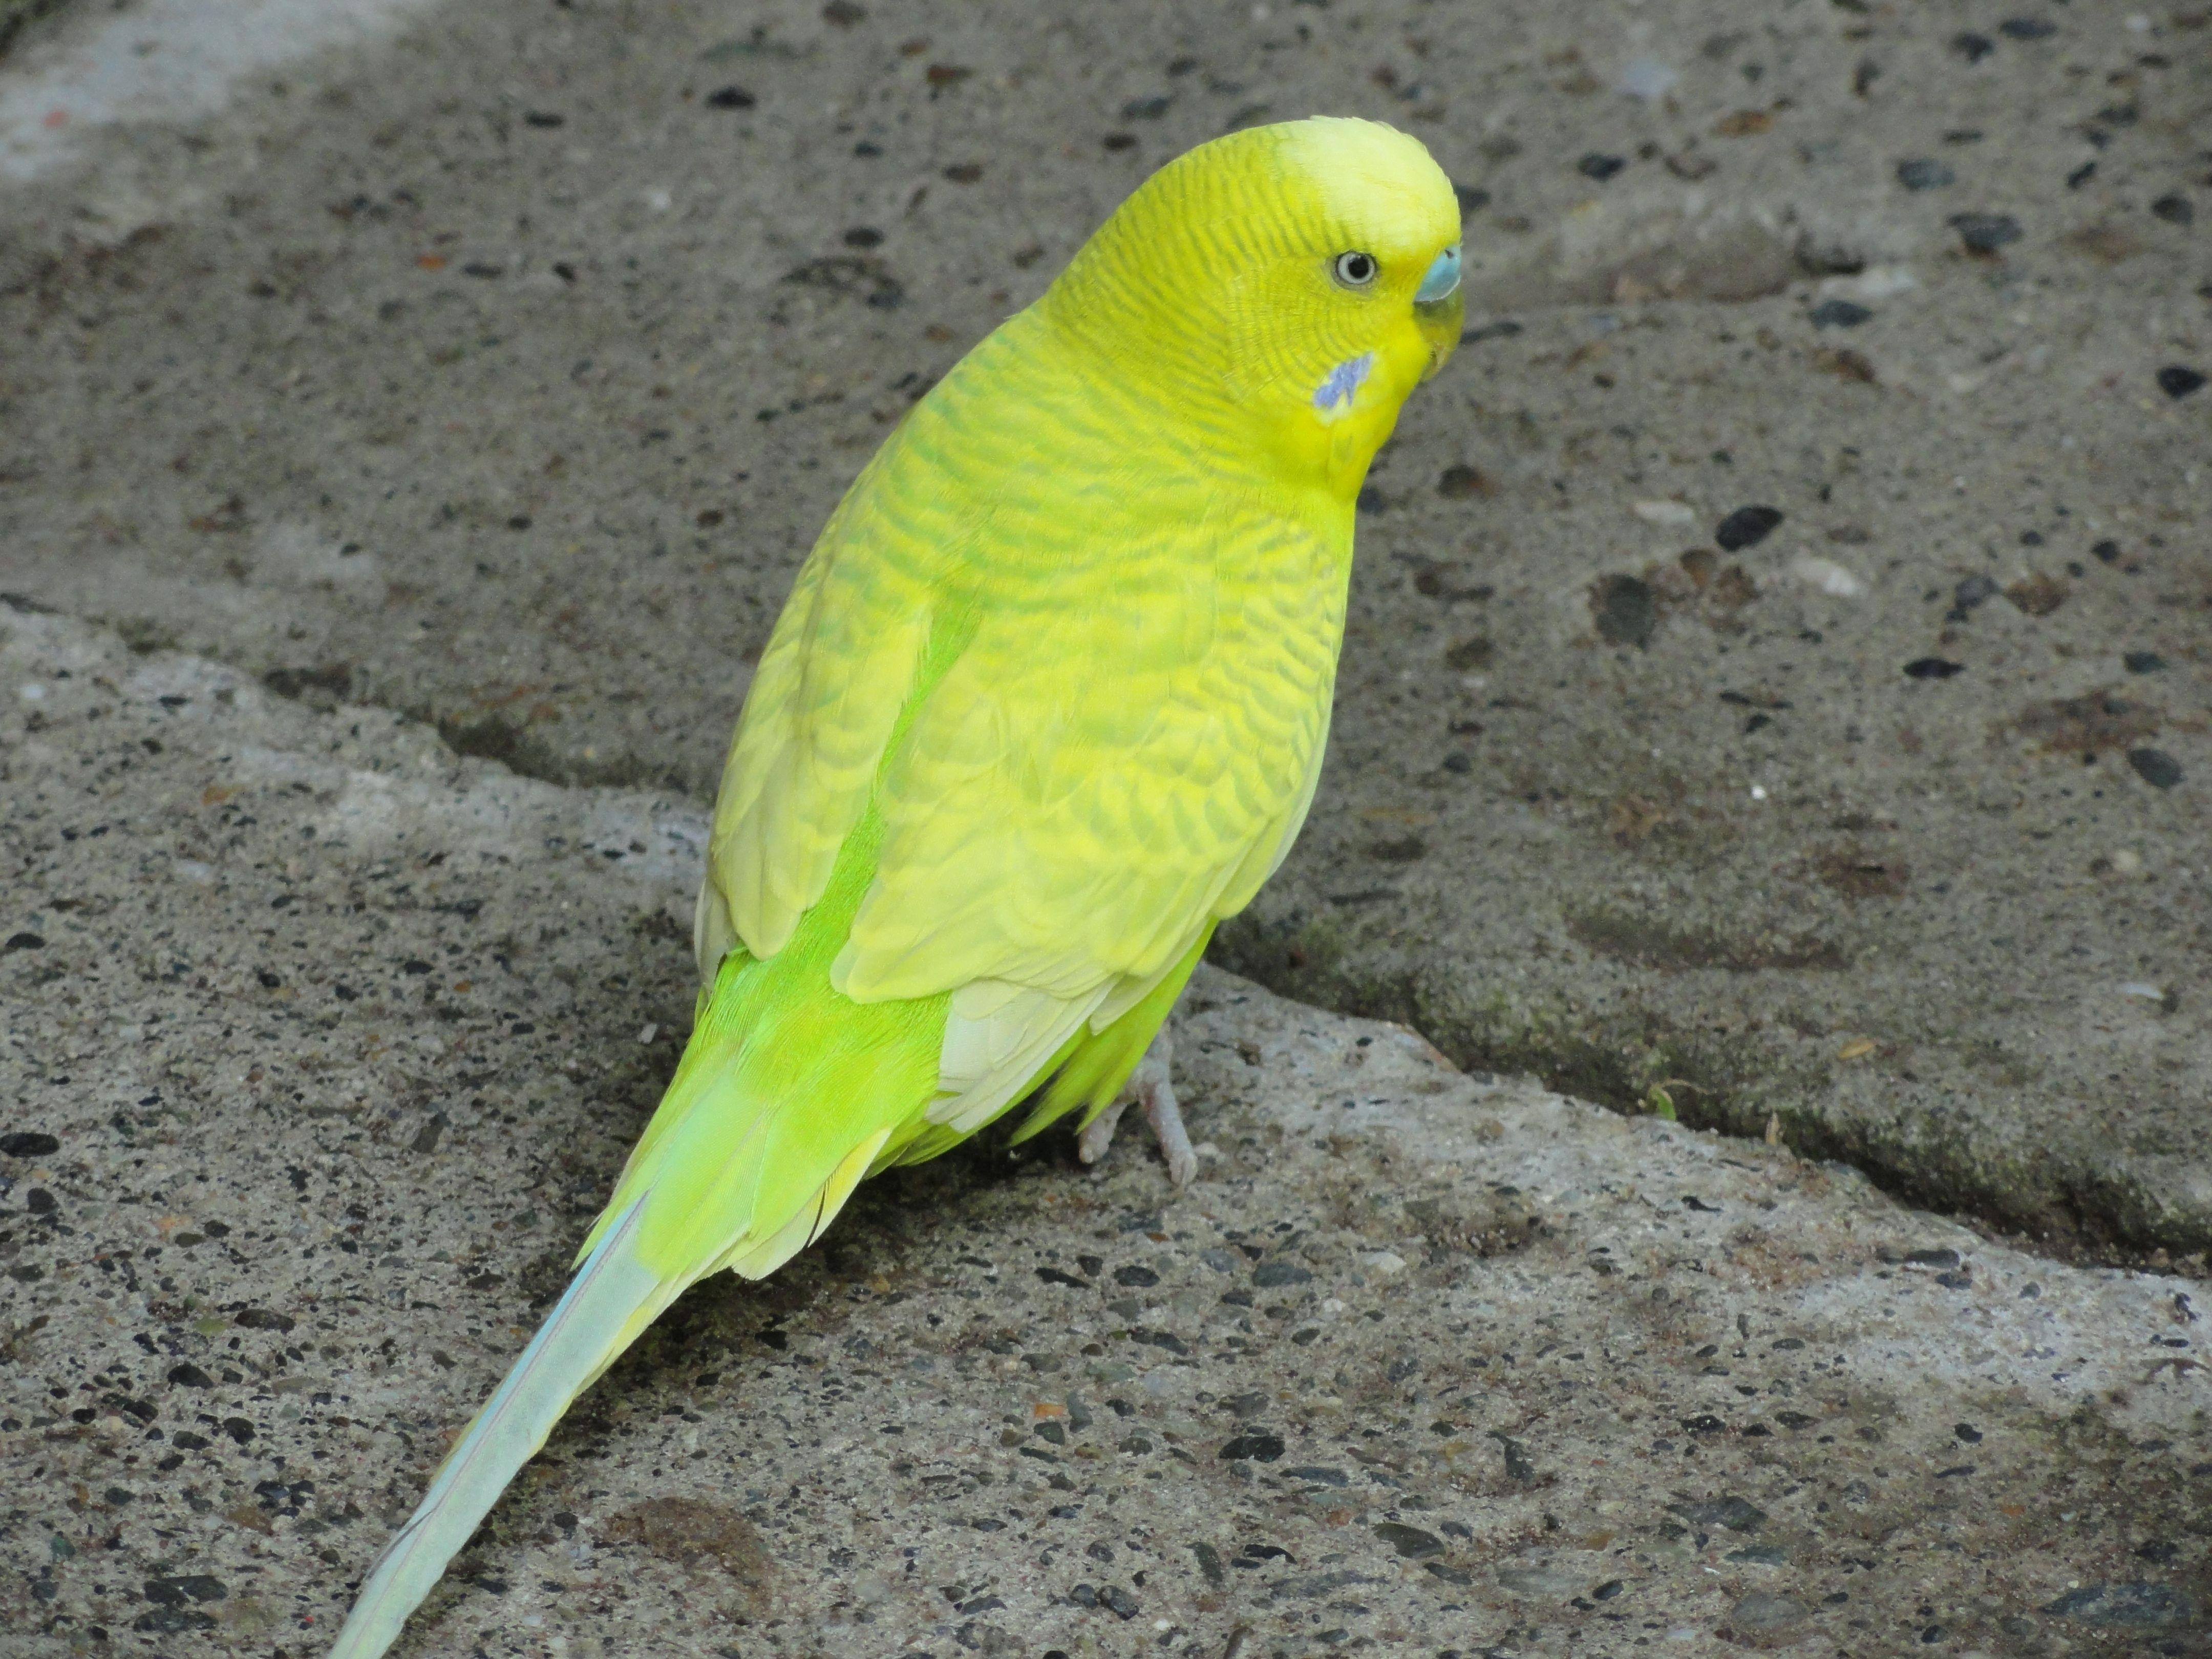 Bird / Pájaro - In Armenia, Colombia